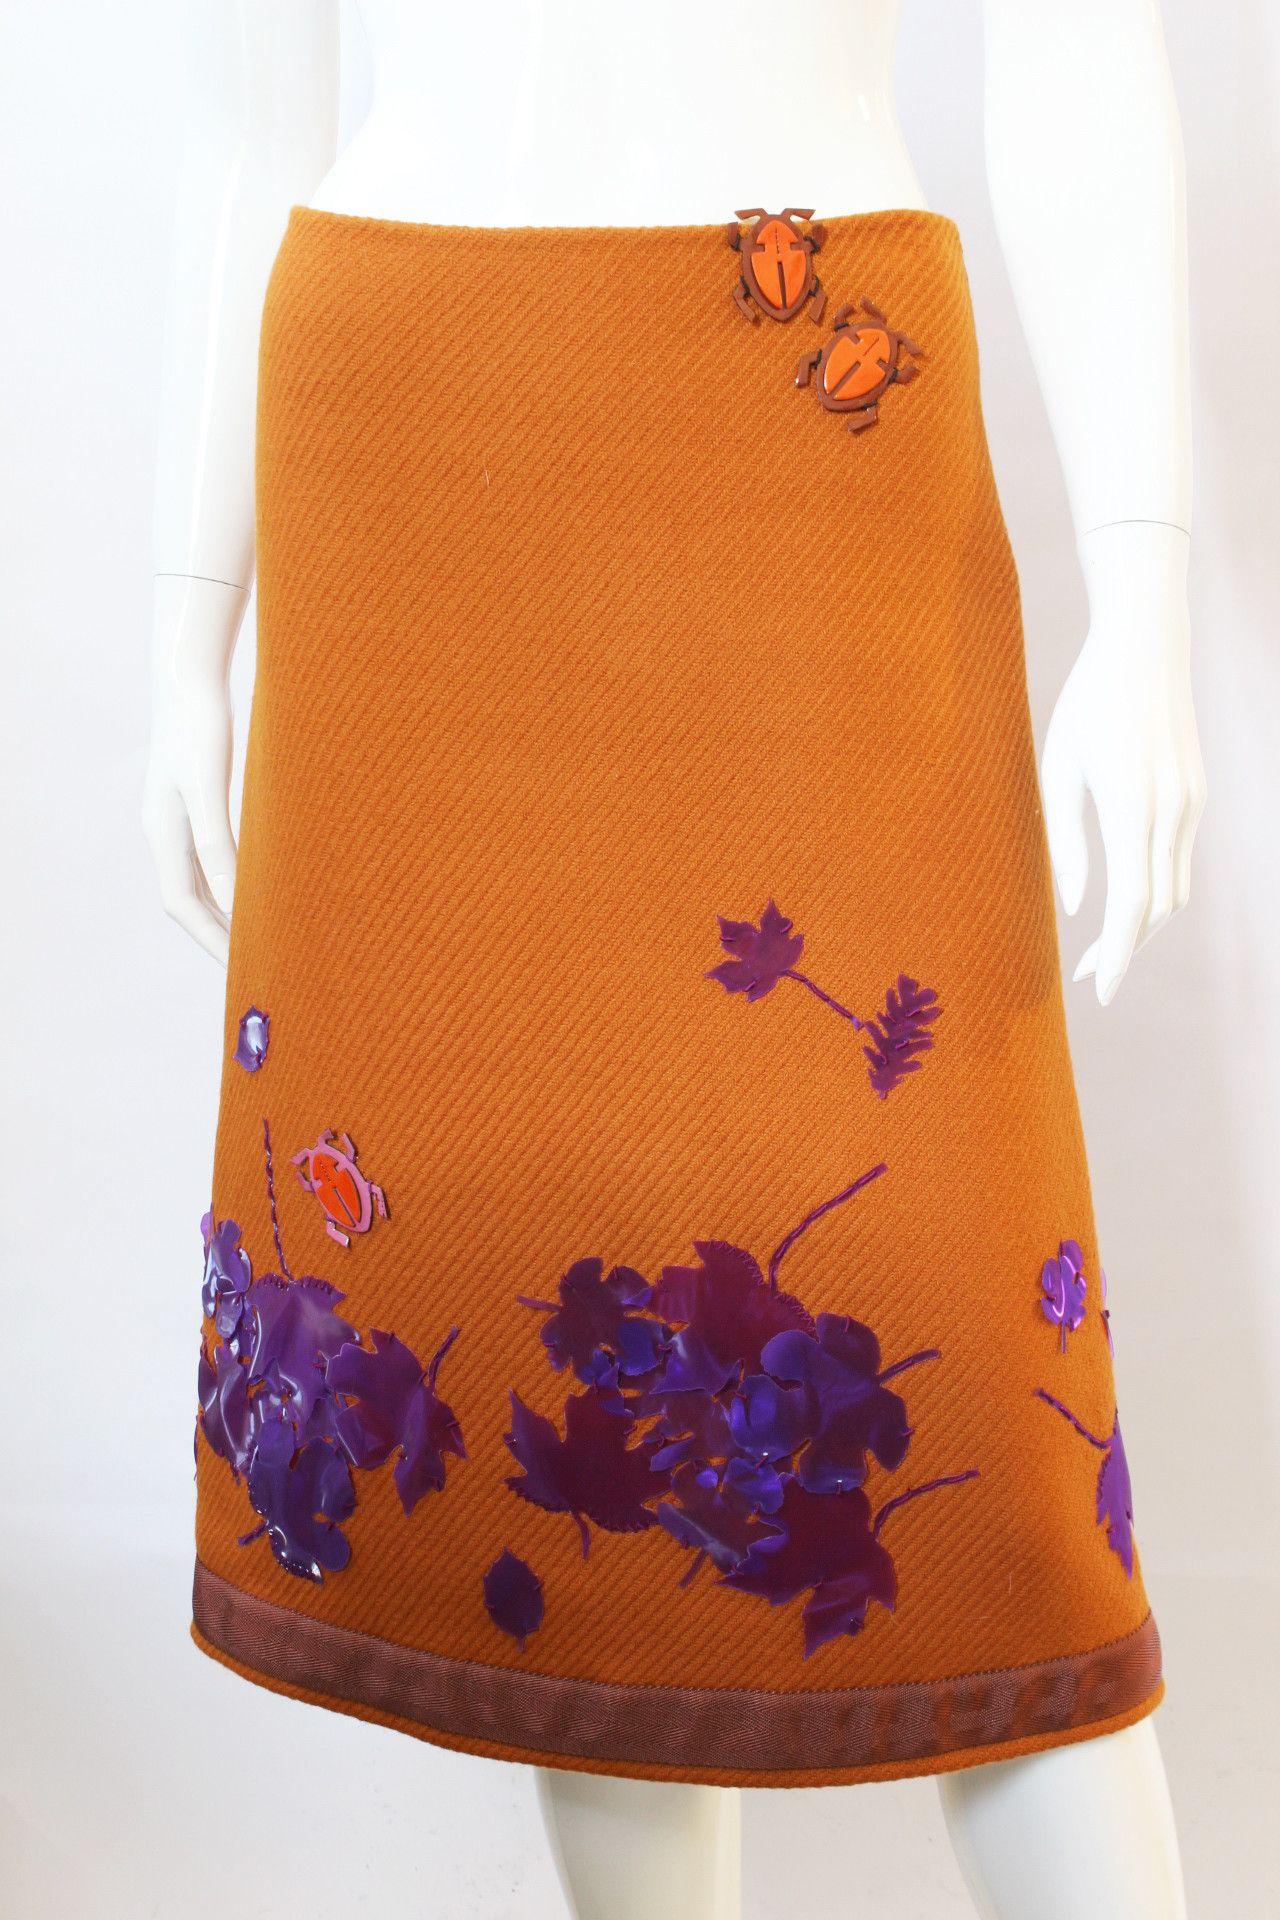 Low Price Sale sequin embellished skirt - Yellow & Orange Prada Geniue Stockist Sale Online Cheap Fashionable okeQ8iPXJ